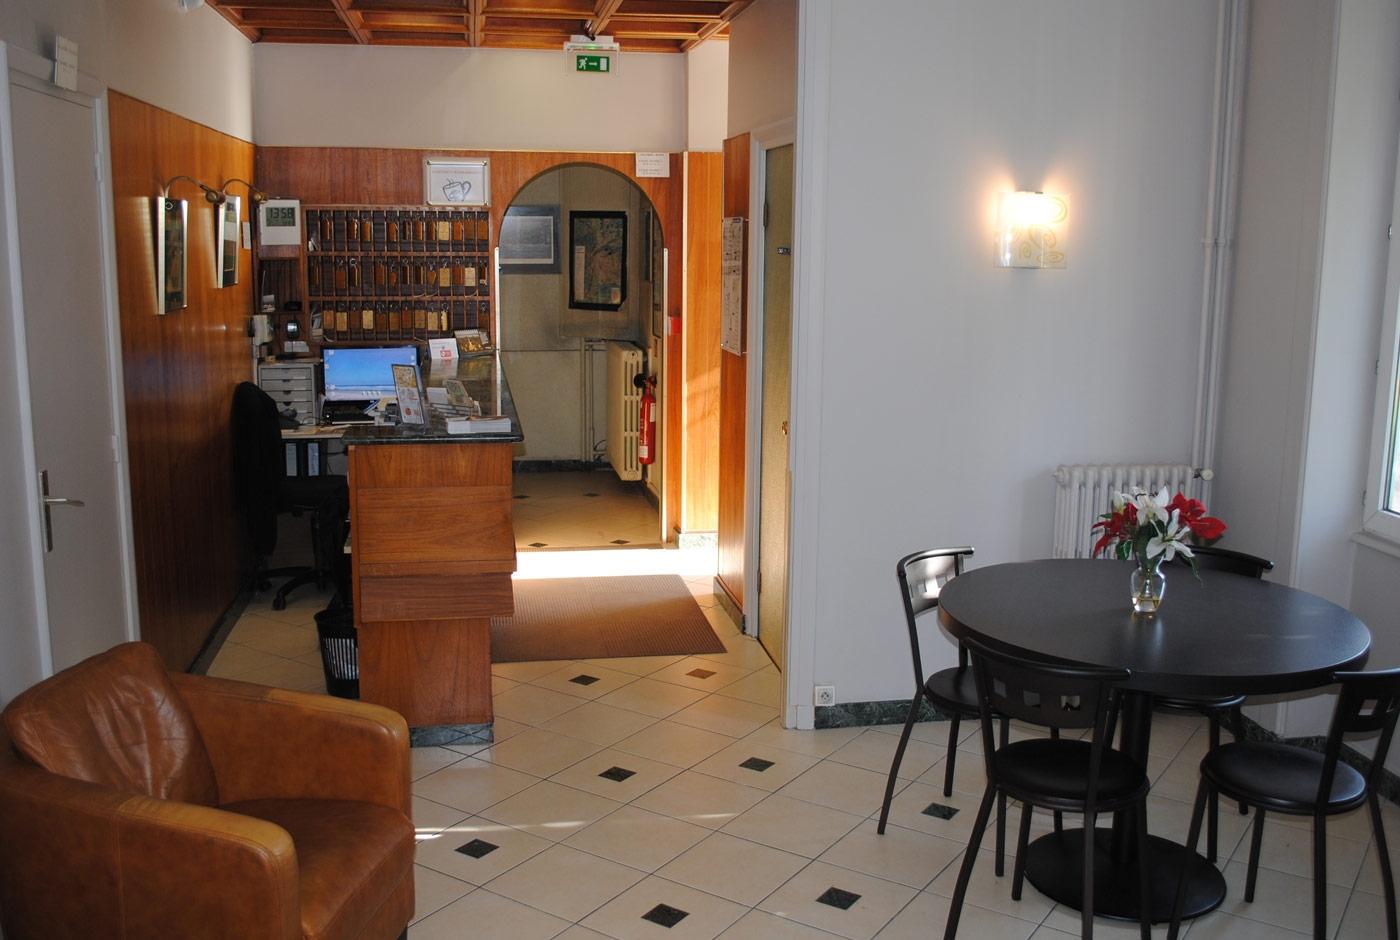 hotel-lacassagne-home-slide08